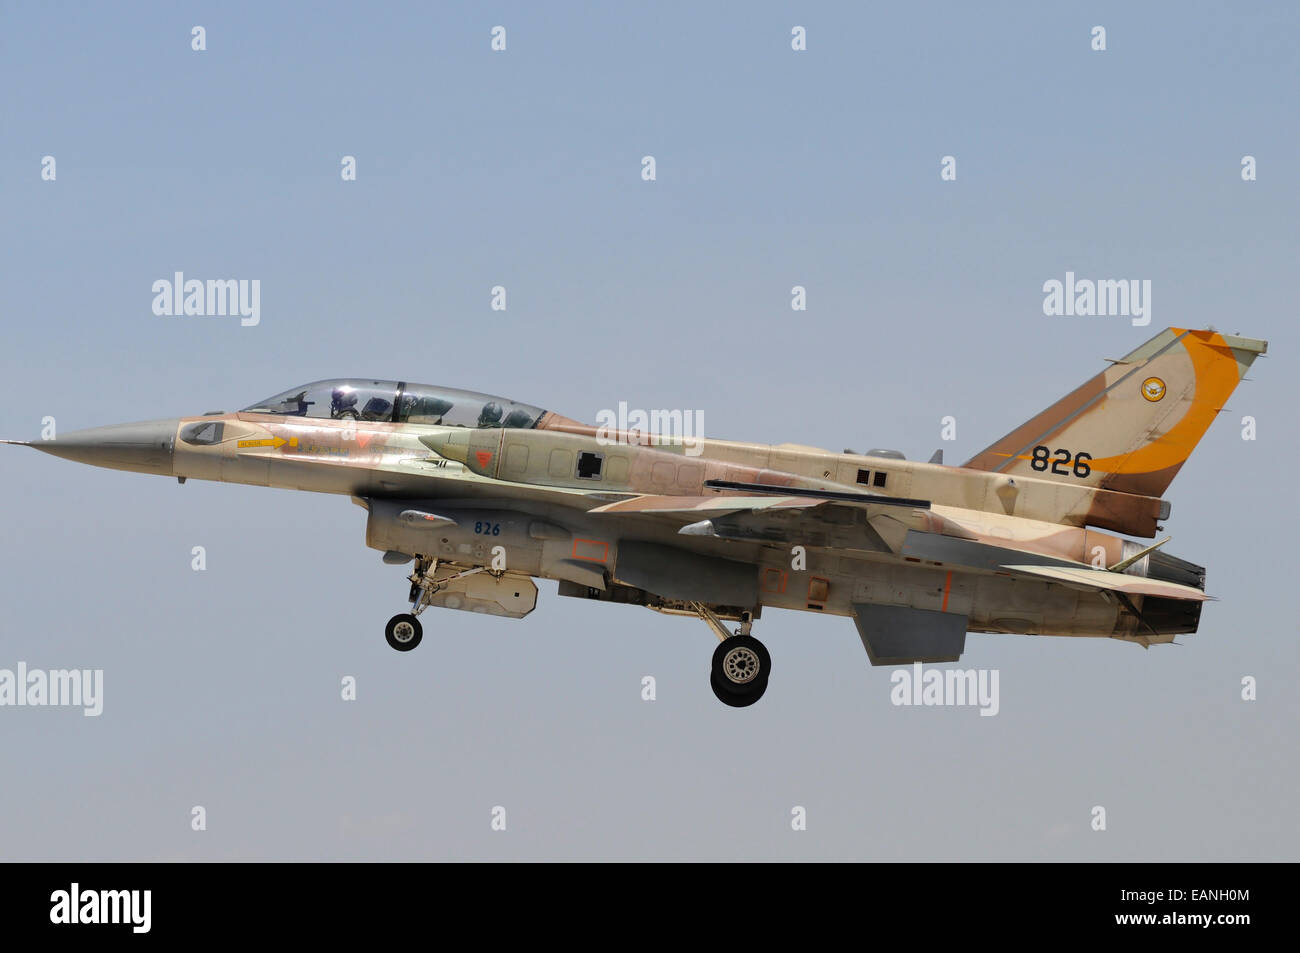 Israeli Air Force F-16I Sufa prepares for landing at Hatzerim Airbase, Israel. Stock Photo